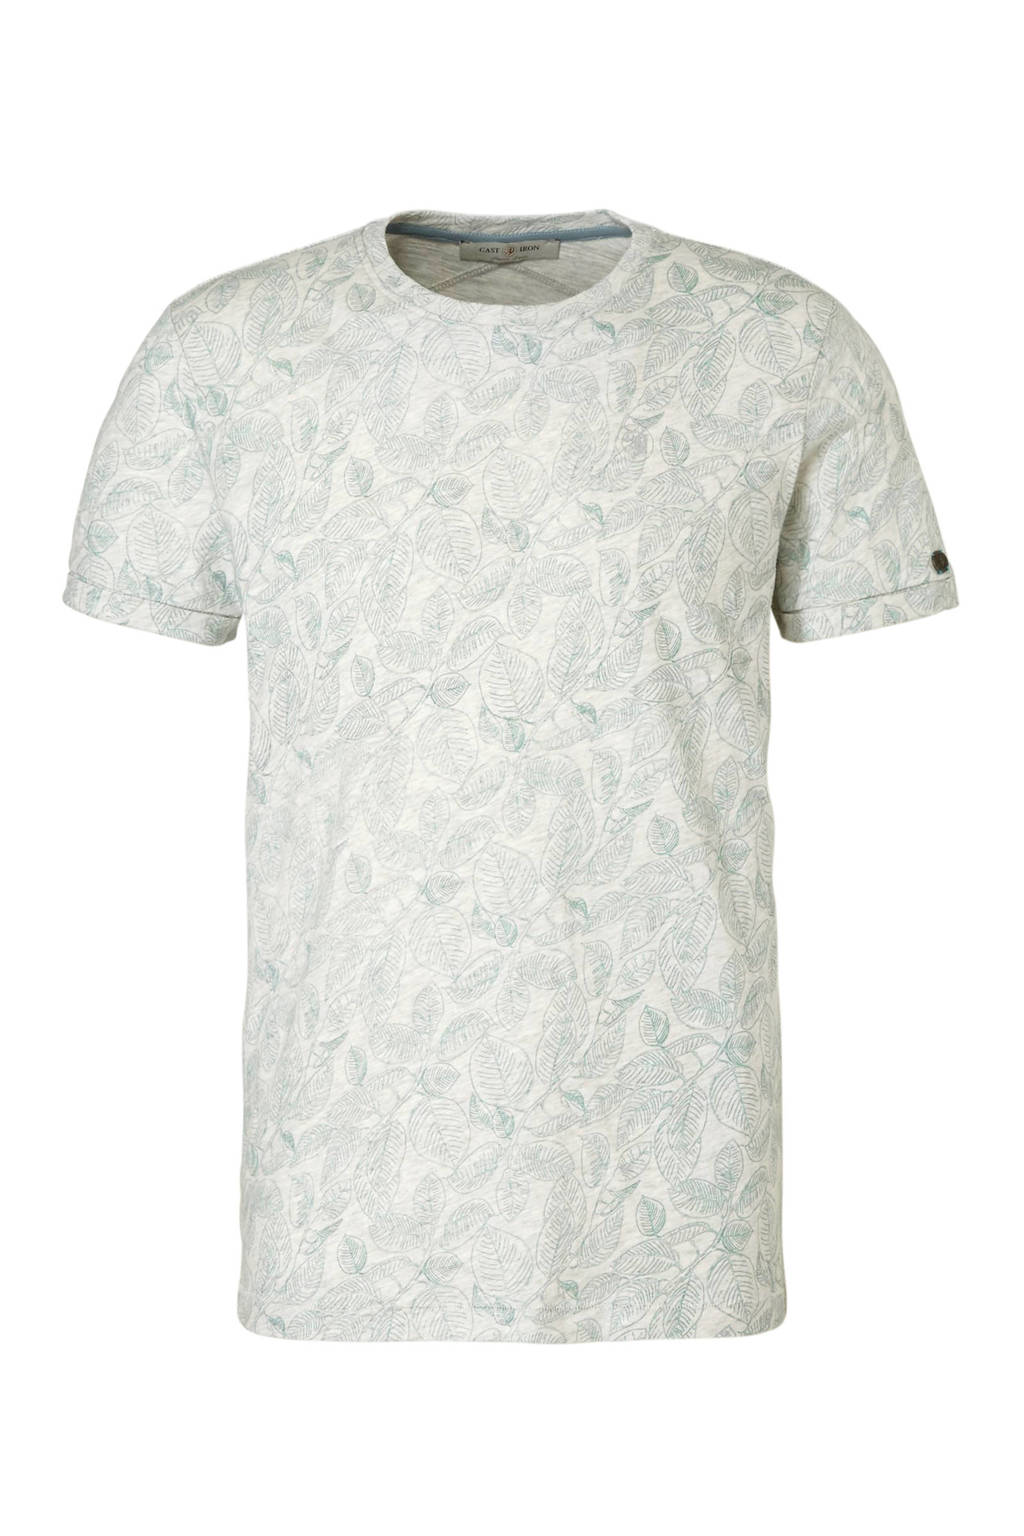 Cast Iron T-shirt met print, Grijs